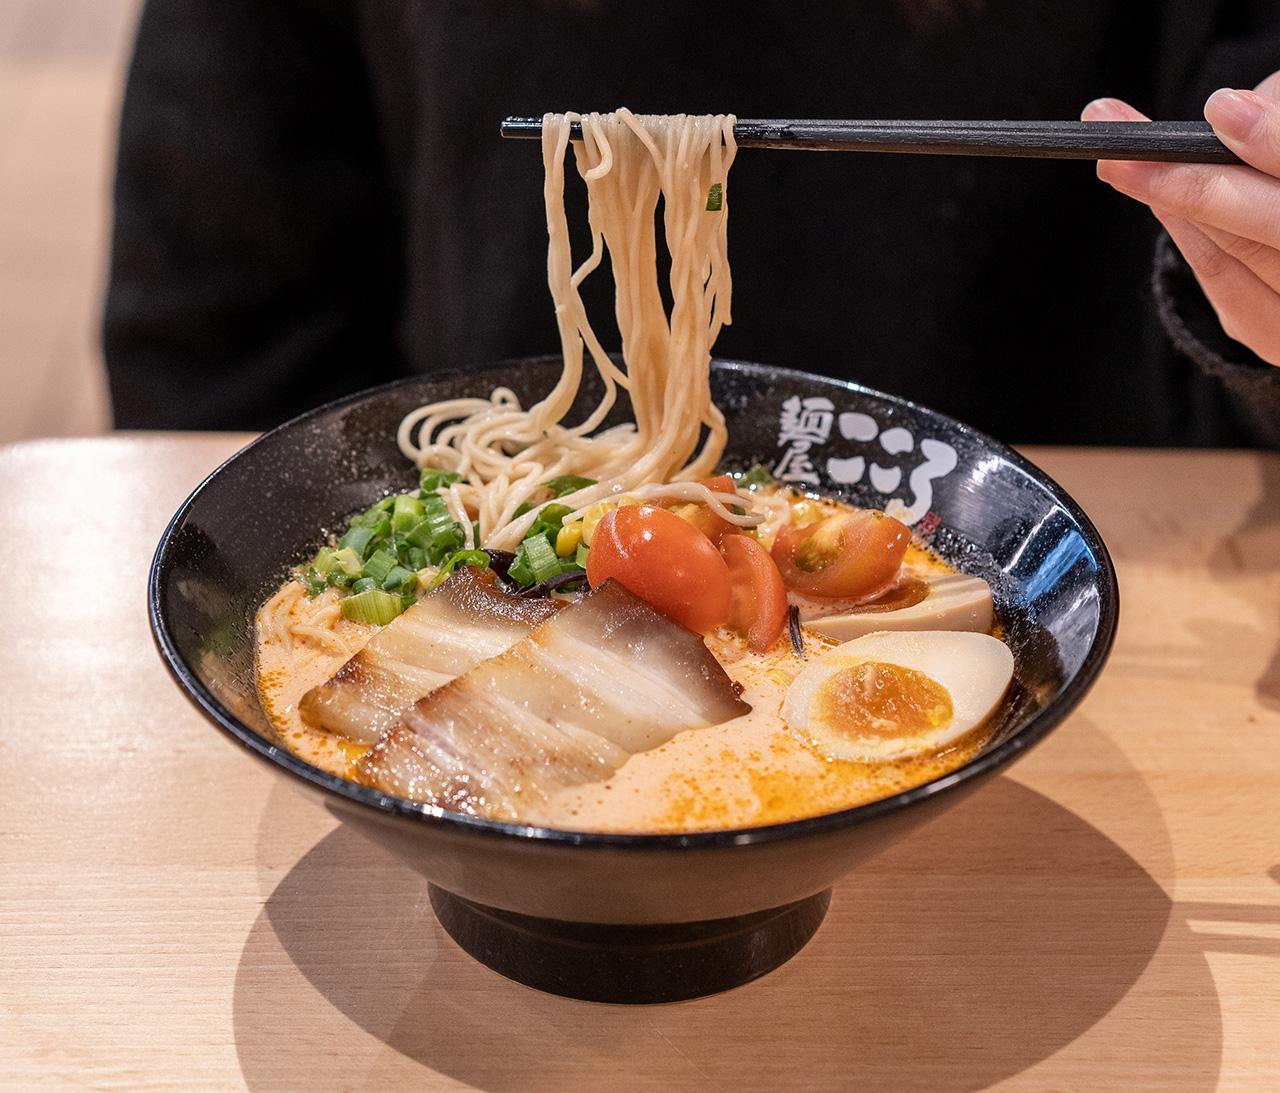 Thin ramen noodles soak up the creamy tomato pork broth.